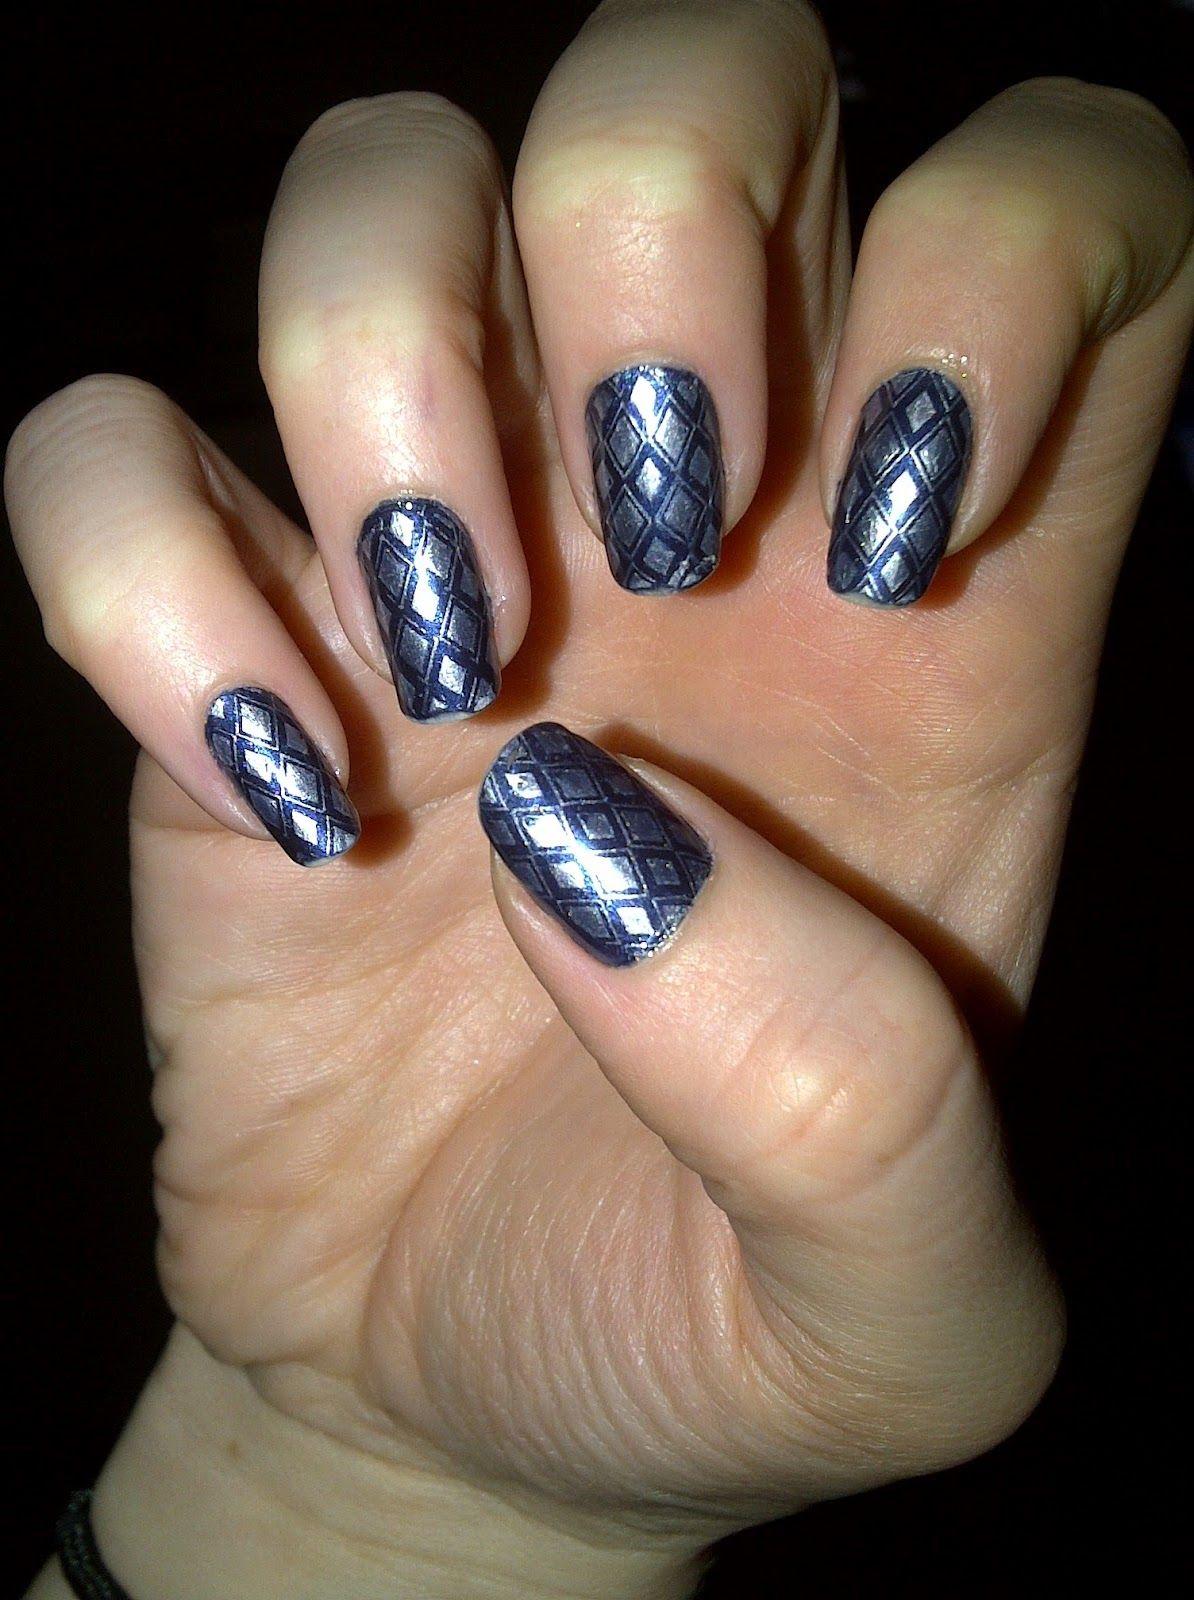 Nails| http://my-creative-nails-ideas.blogspot.com